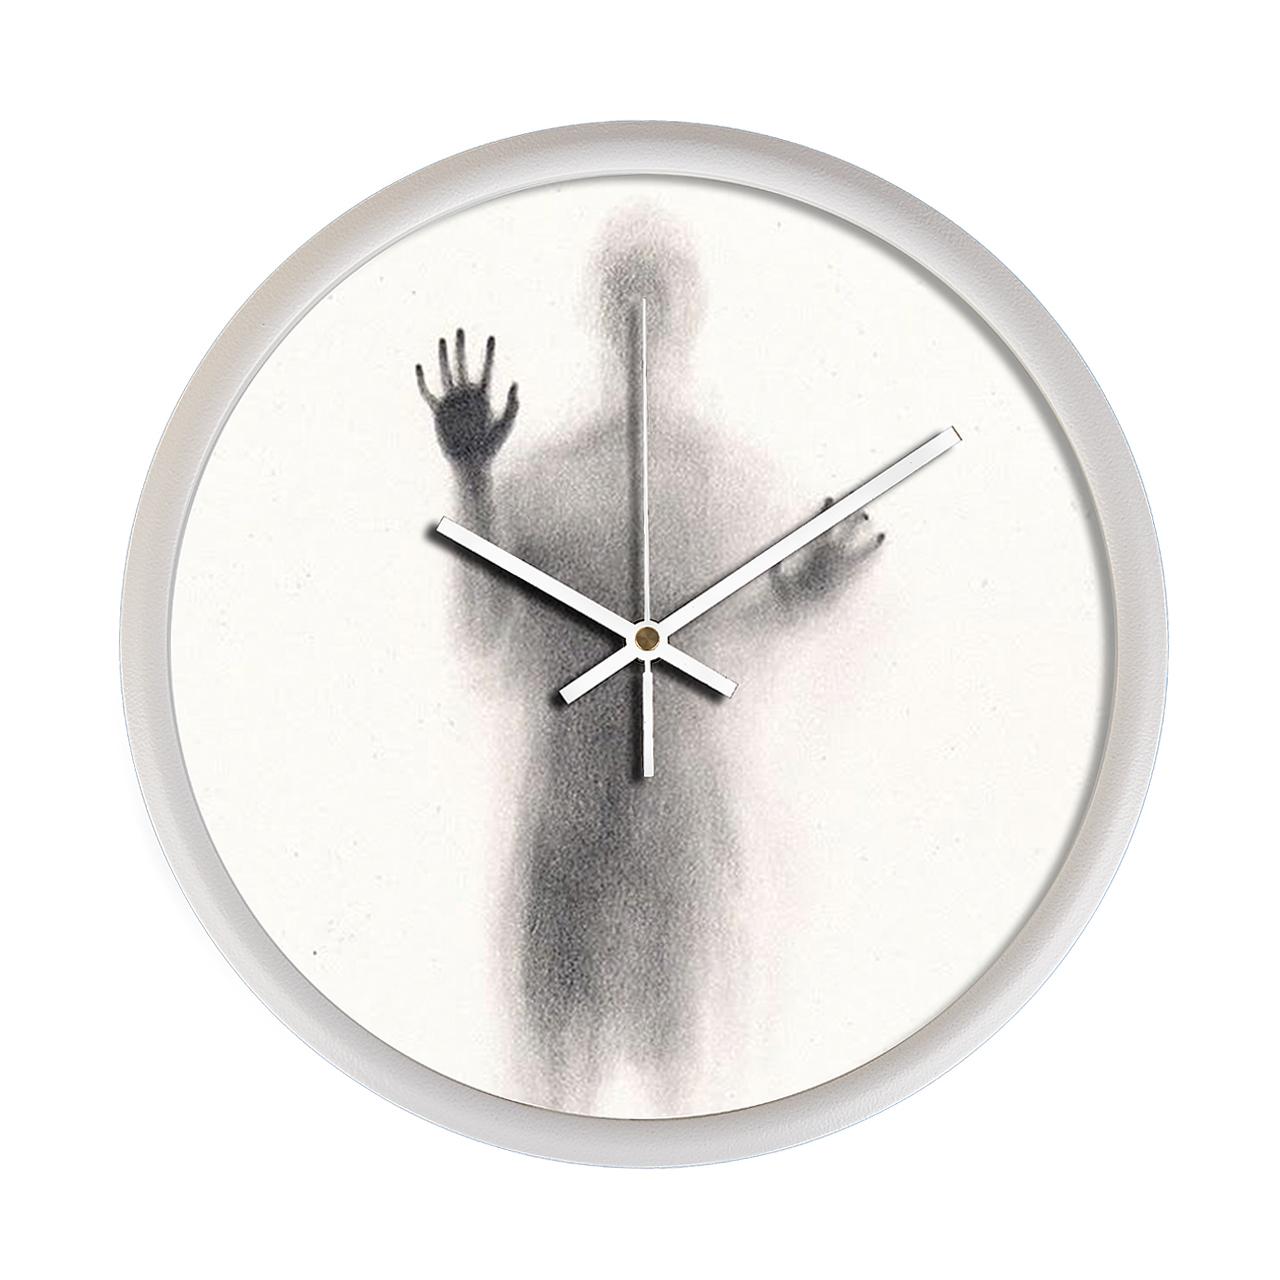 ساعت دیواری مینی مال لاکچری مدل 35Dio3_0721